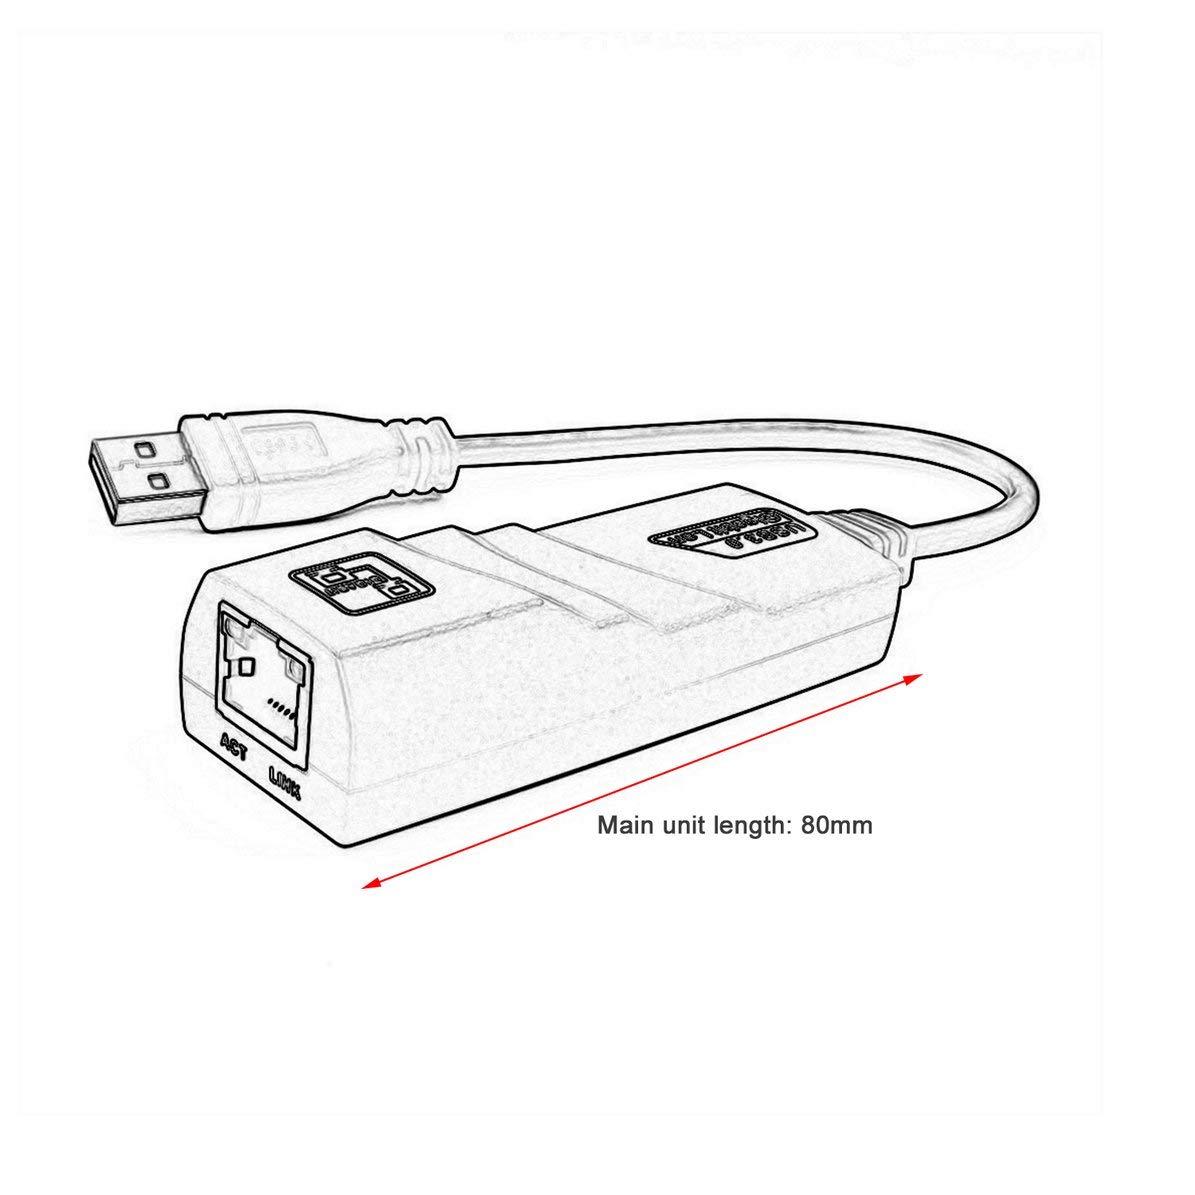 DoMoment USB 3.0 Gigabit LAN USB 3.0 to RJ45 Gigabit Ethernet Adapter 10//100//1000Mbps Computer to Router Network Adapter